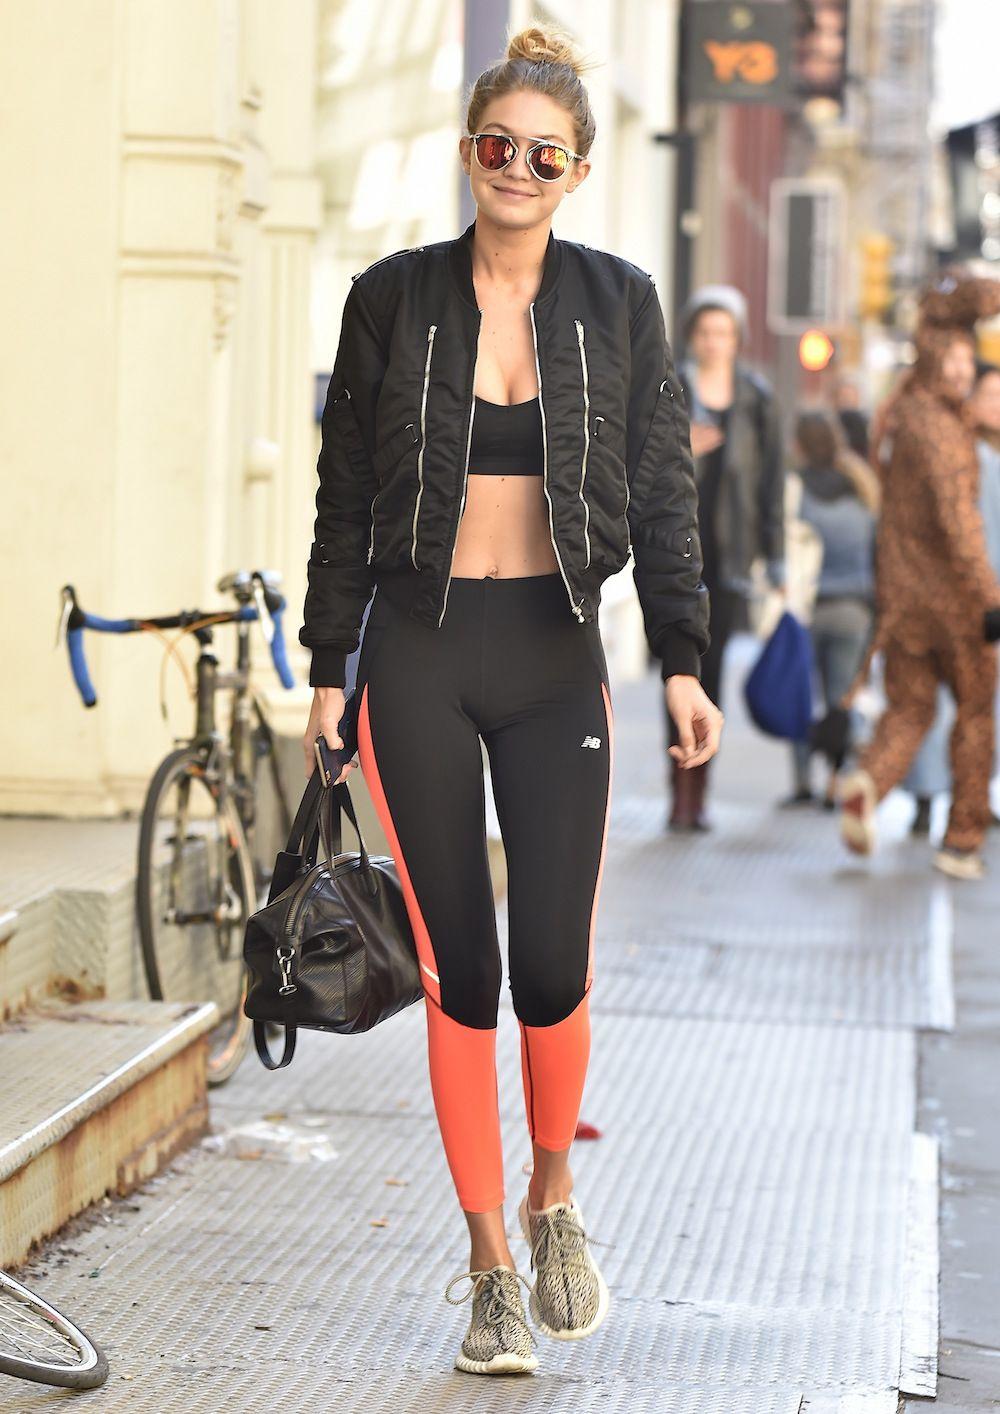 2fdafa01ff2 Gigi Hadid totally makes the sports bra look chic with this ensemble ...